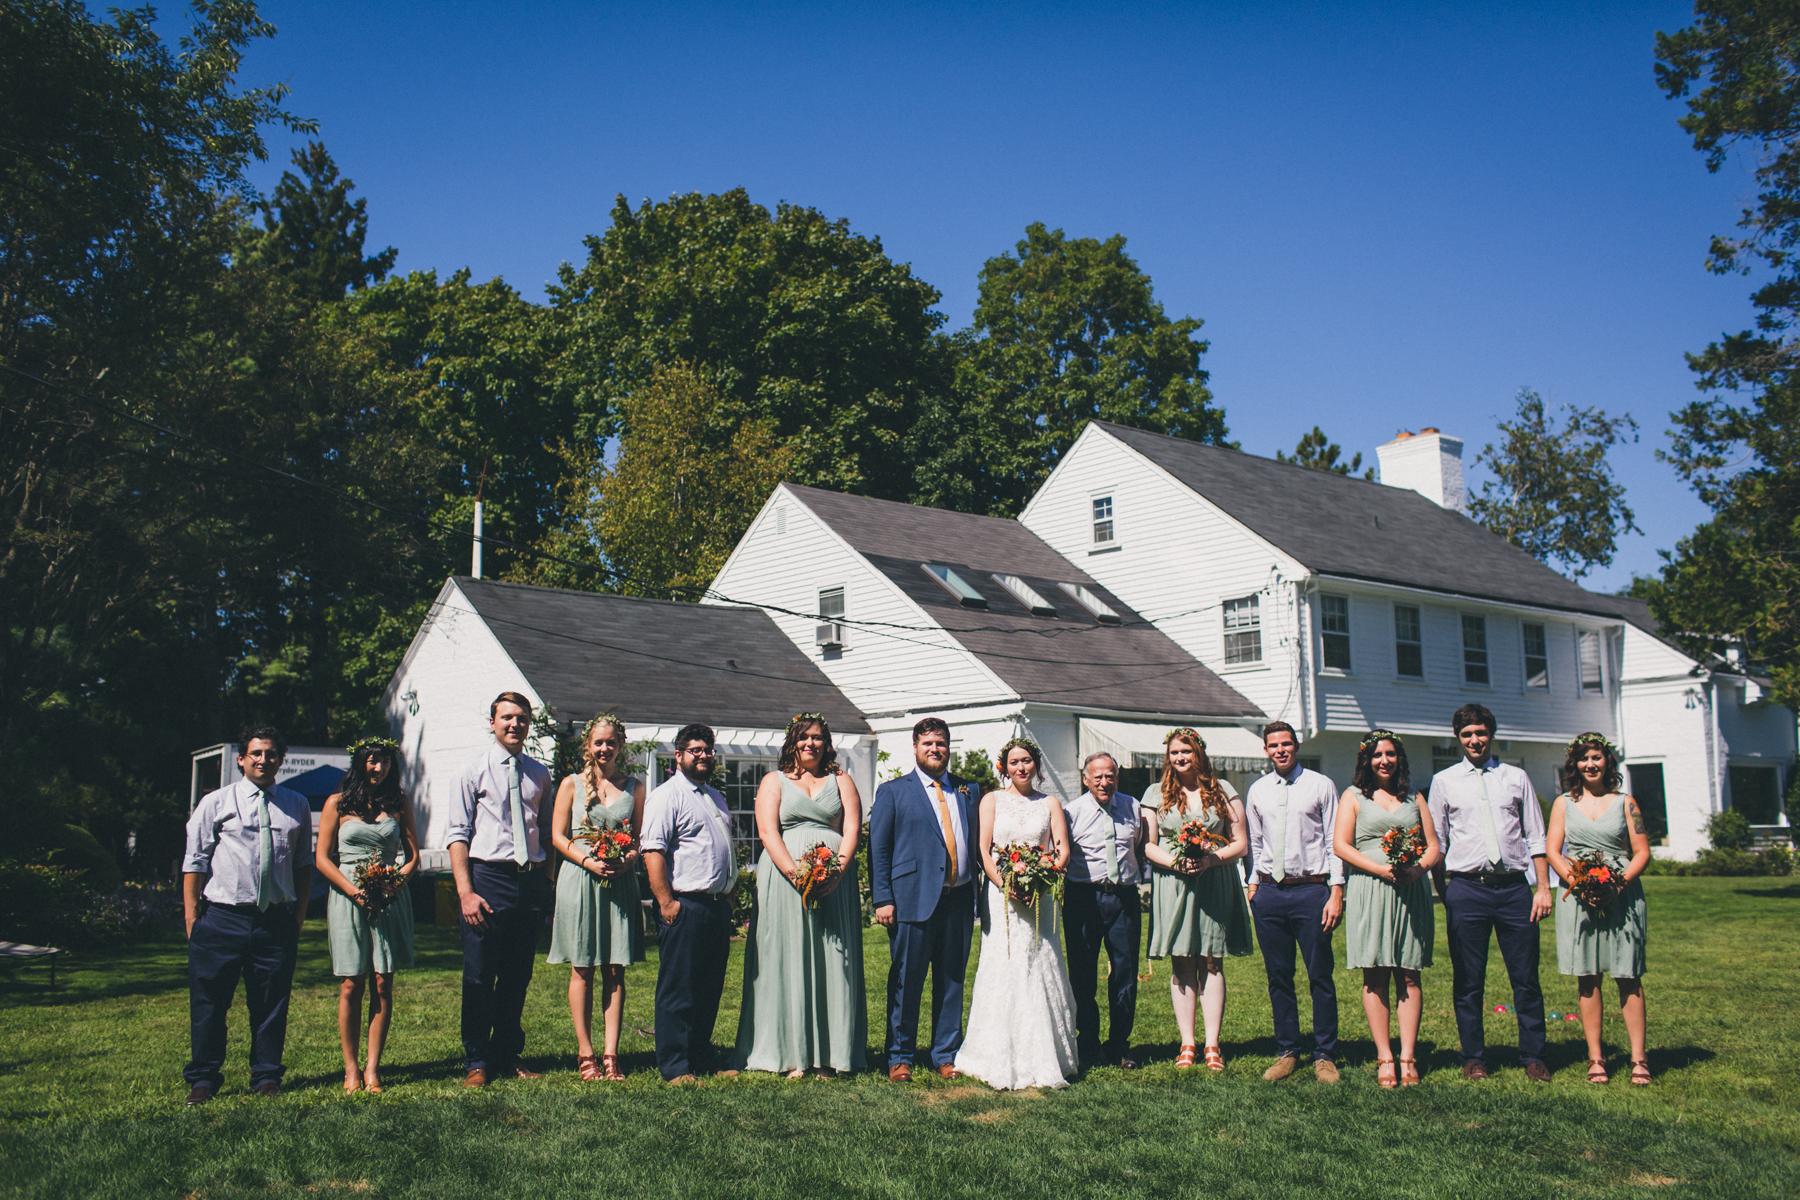 Long-Island-Documentary-Wedding-Photography-Summer-Tent-Wedding-in-New-York-50.jpg